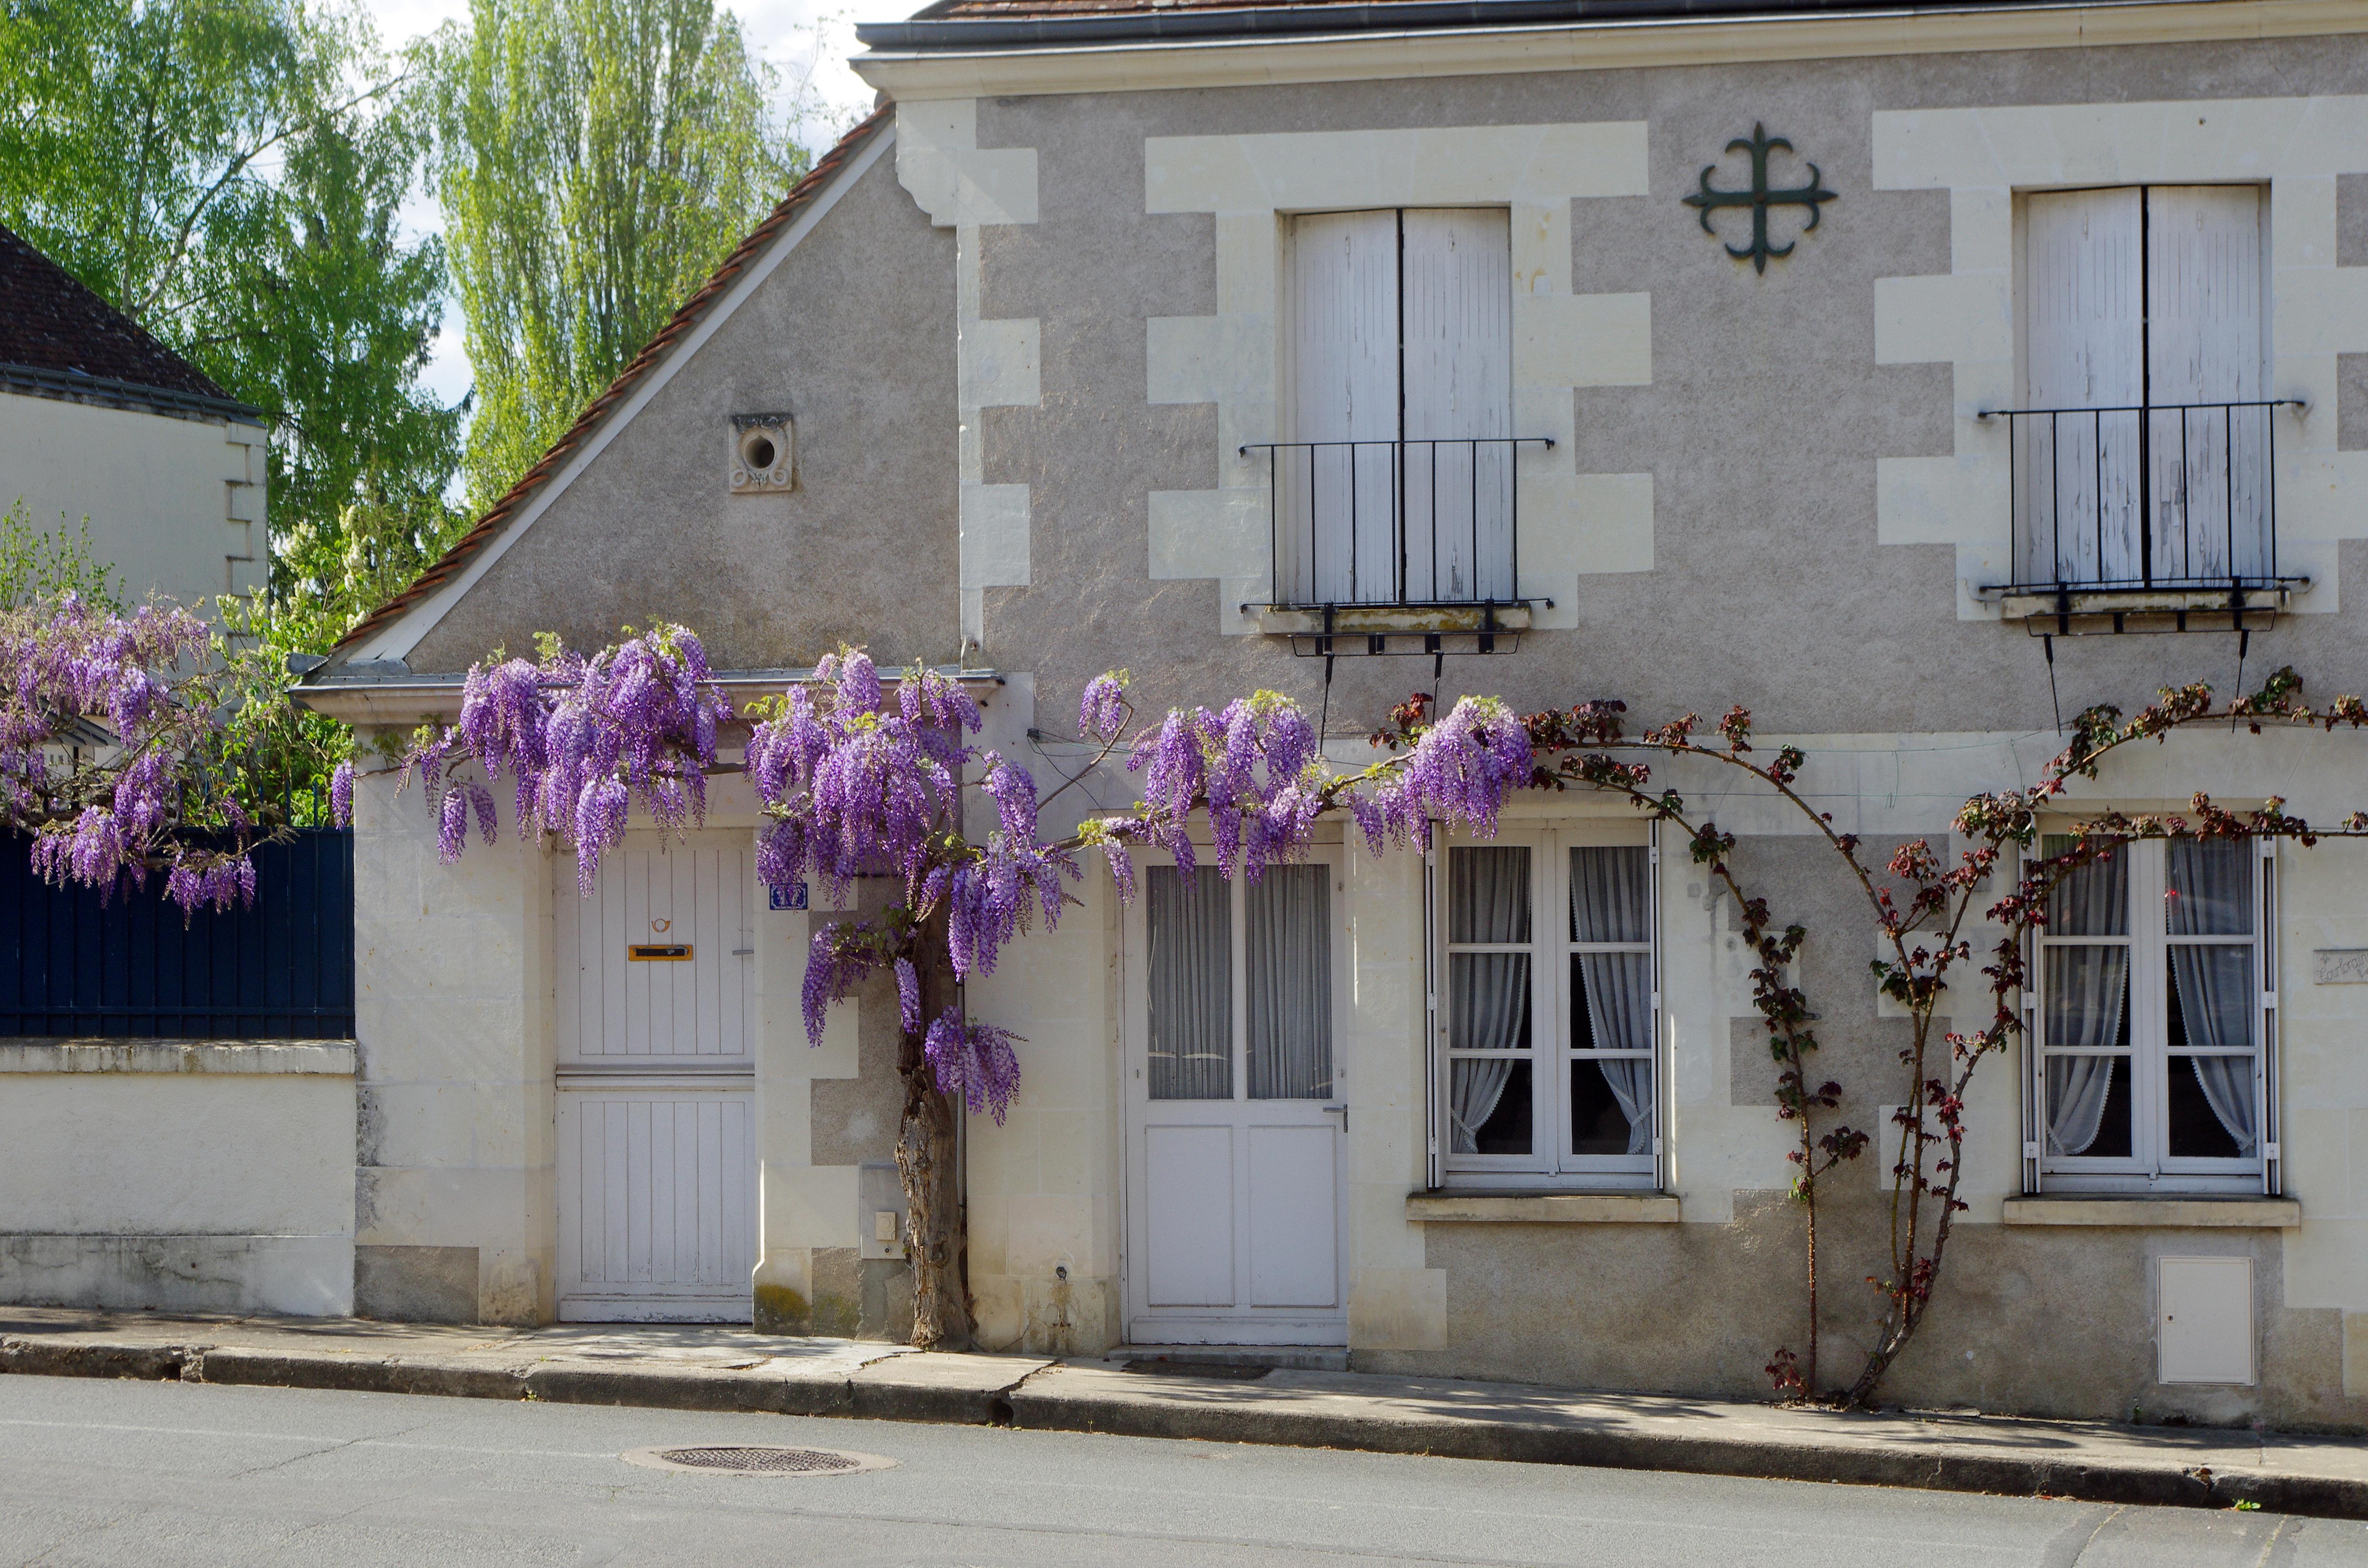 By Daniel Jolivet (Saint-Jean-Saint-Germain (Indre-et-Loire)) [CC BY 2.0 (https://creativecommons.org/licenses/by/2.0)], via Wikimedia Commons